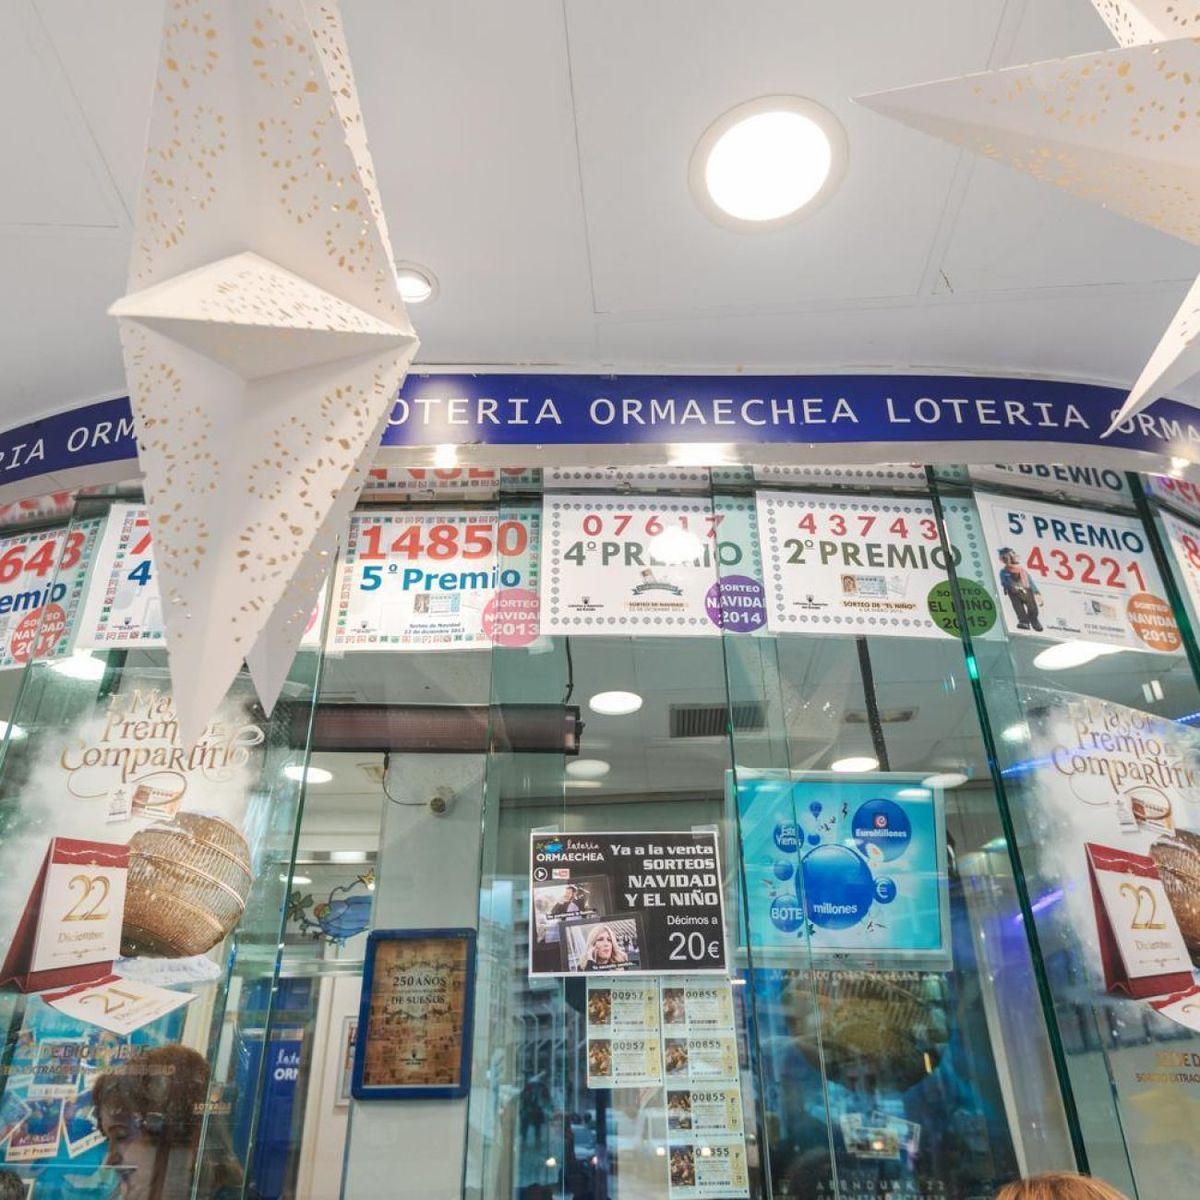 3557-loteria-ormaechea-04